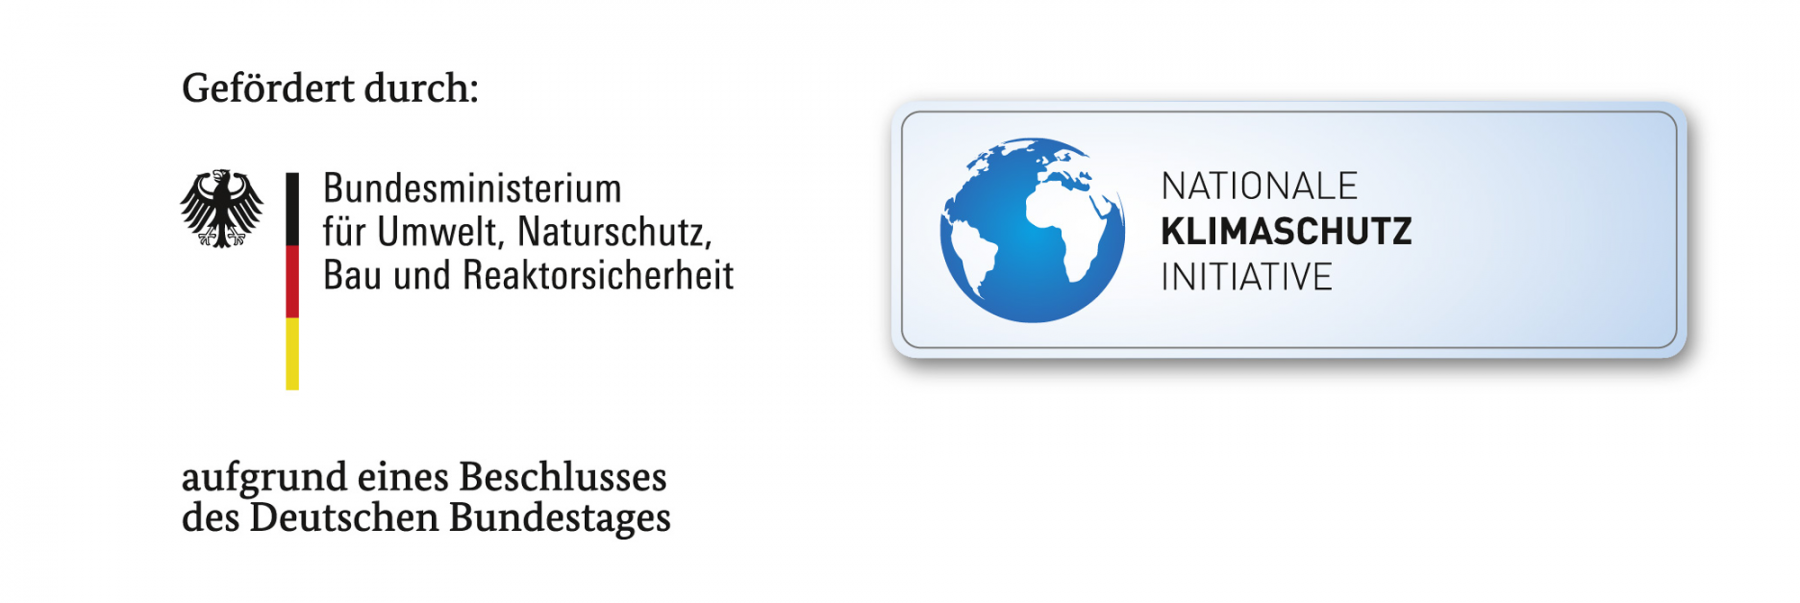 Gefördert von BMUB & NKI